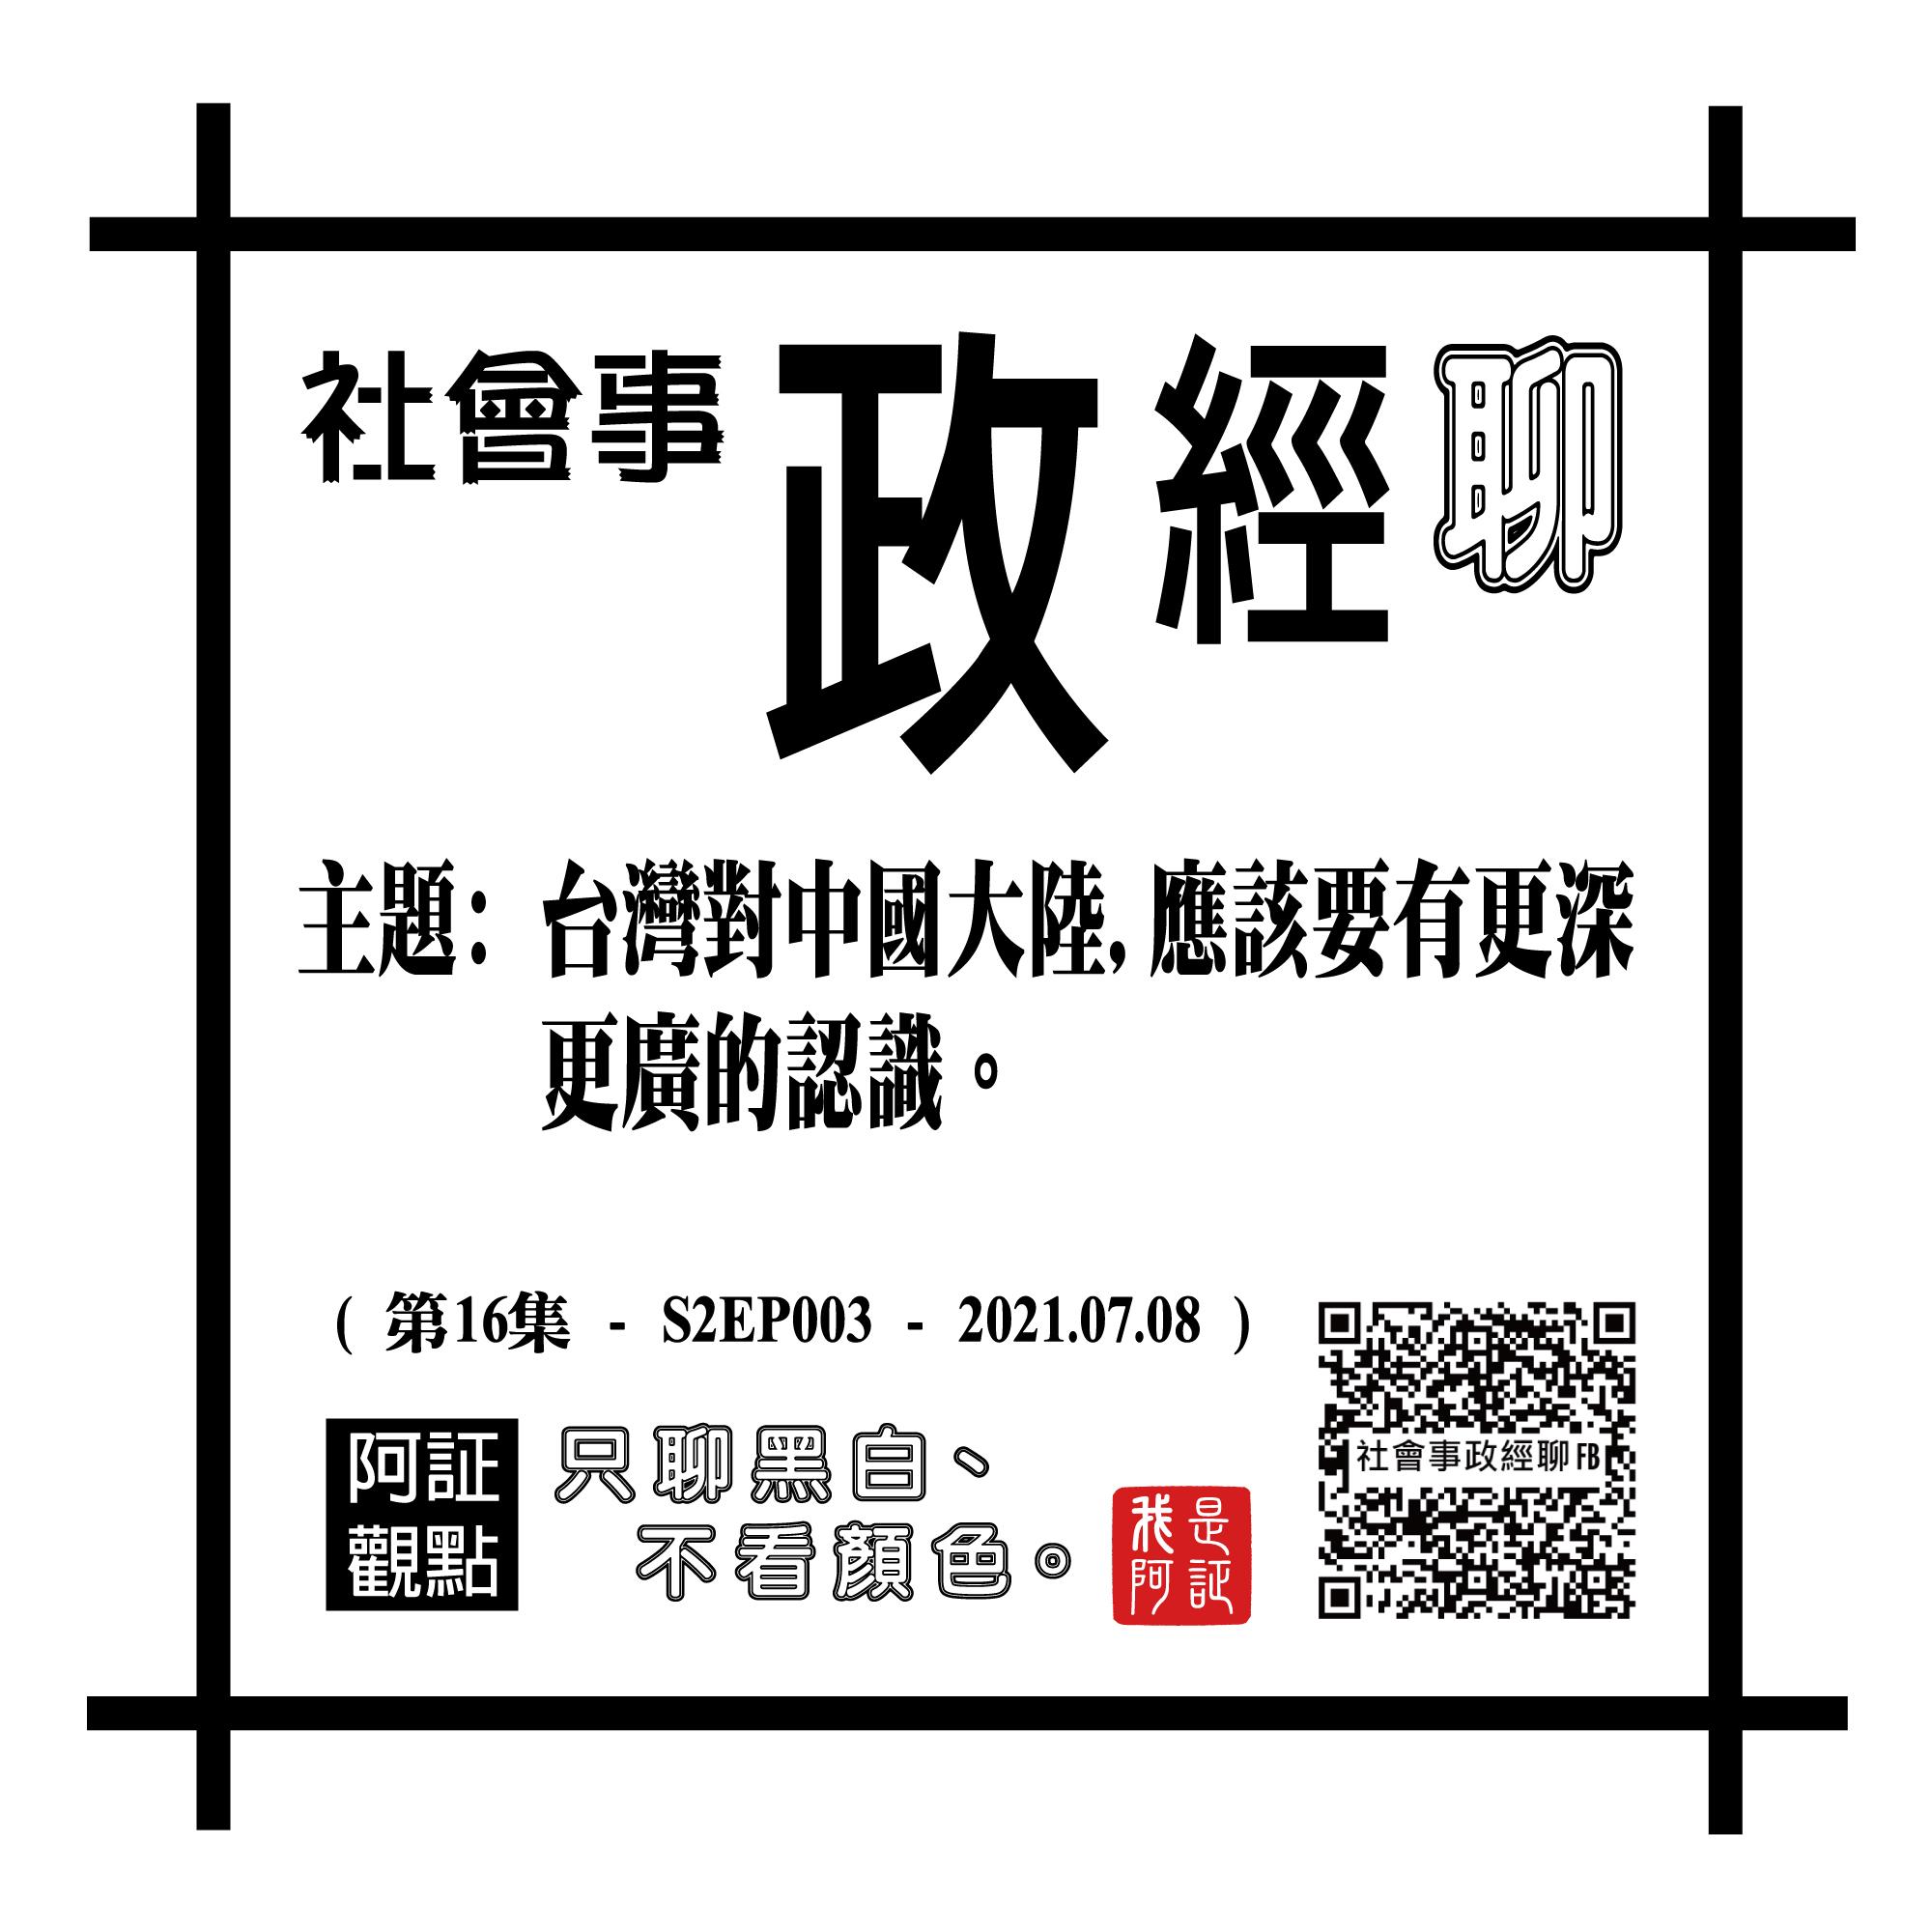 #16 l S2EP003 l 主題: 台灣對中國大陸應有更深更廣的認識 (20210708-社會事政經聊第16集)